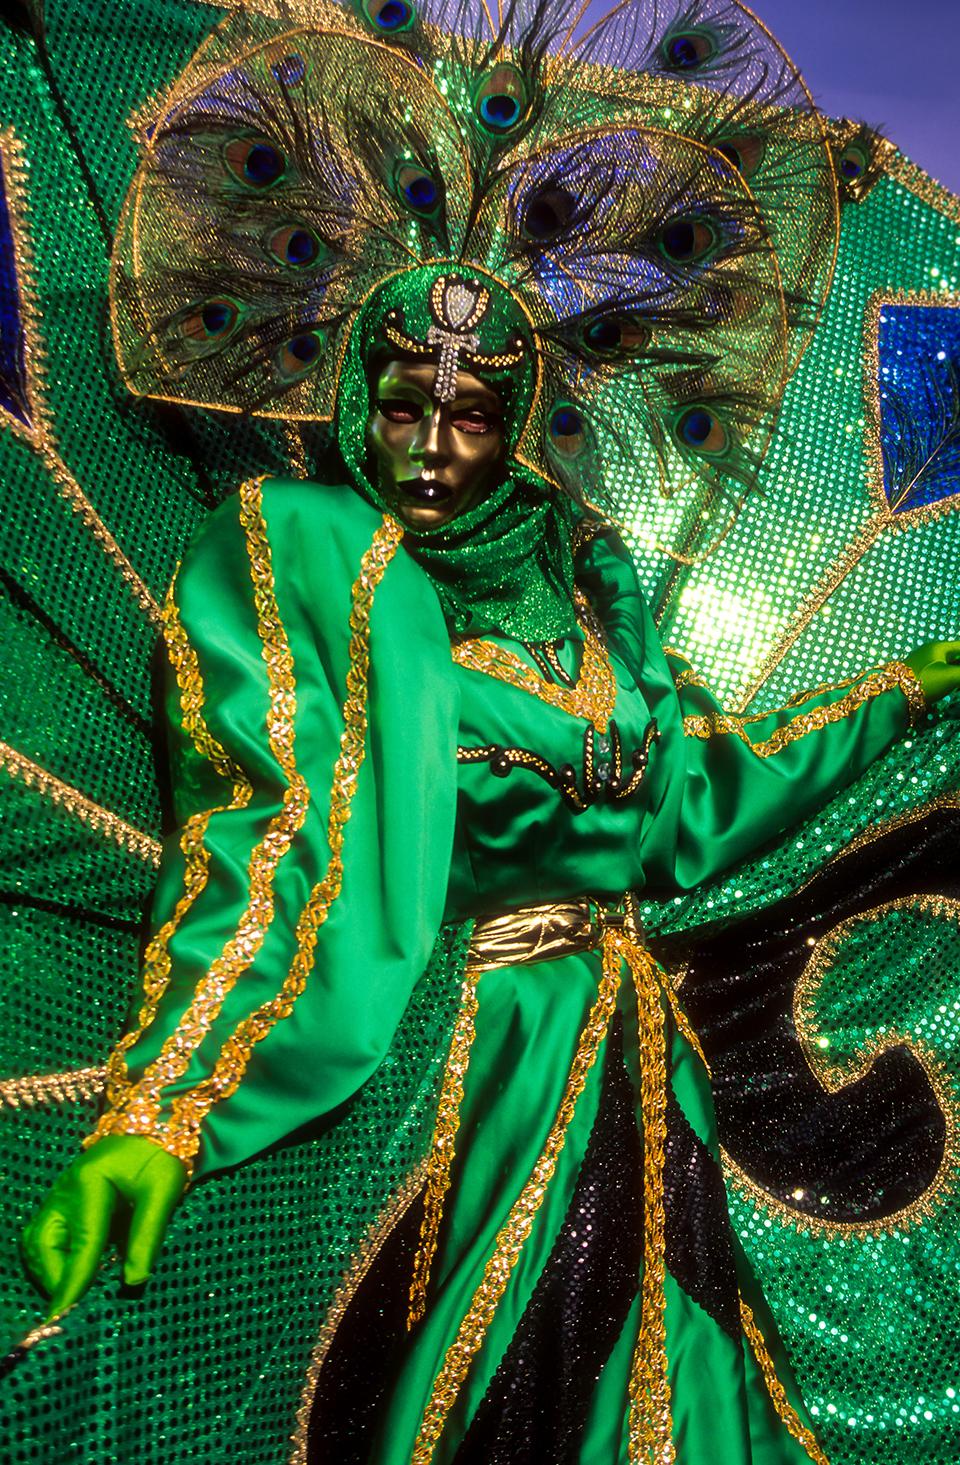 Portrait of GREEN V3 venetian Carnivale costume  at Carnivale, Venice, Italy 1999 (LC).jpg